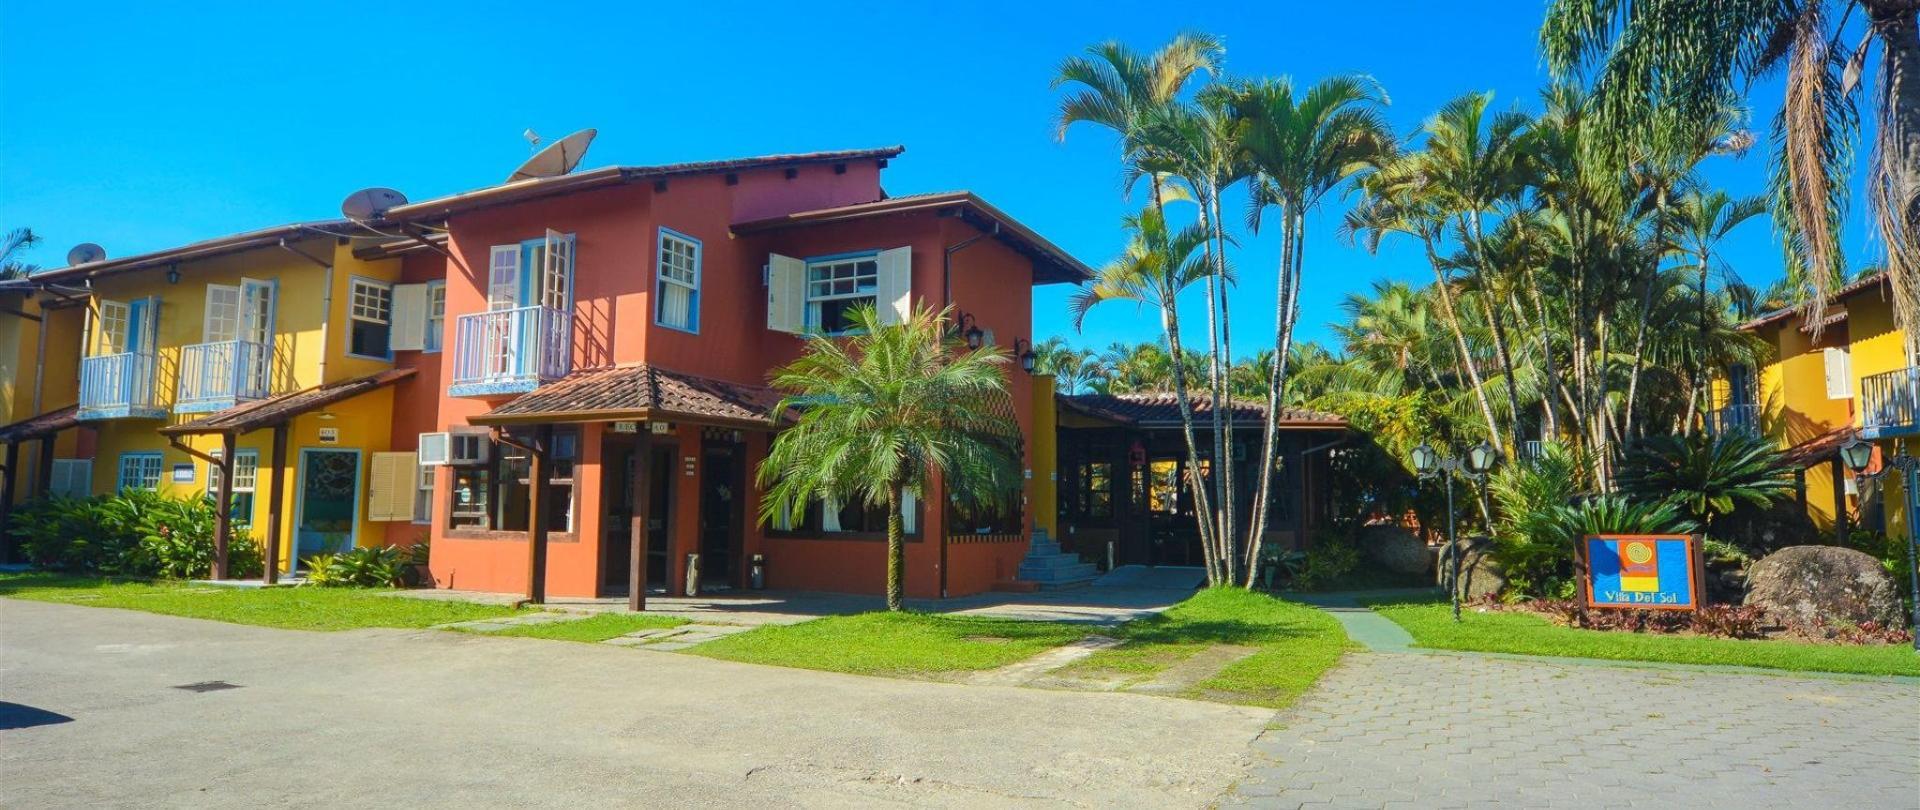 Pousada Villa del Sol - Paraty - Brasil4.jpg